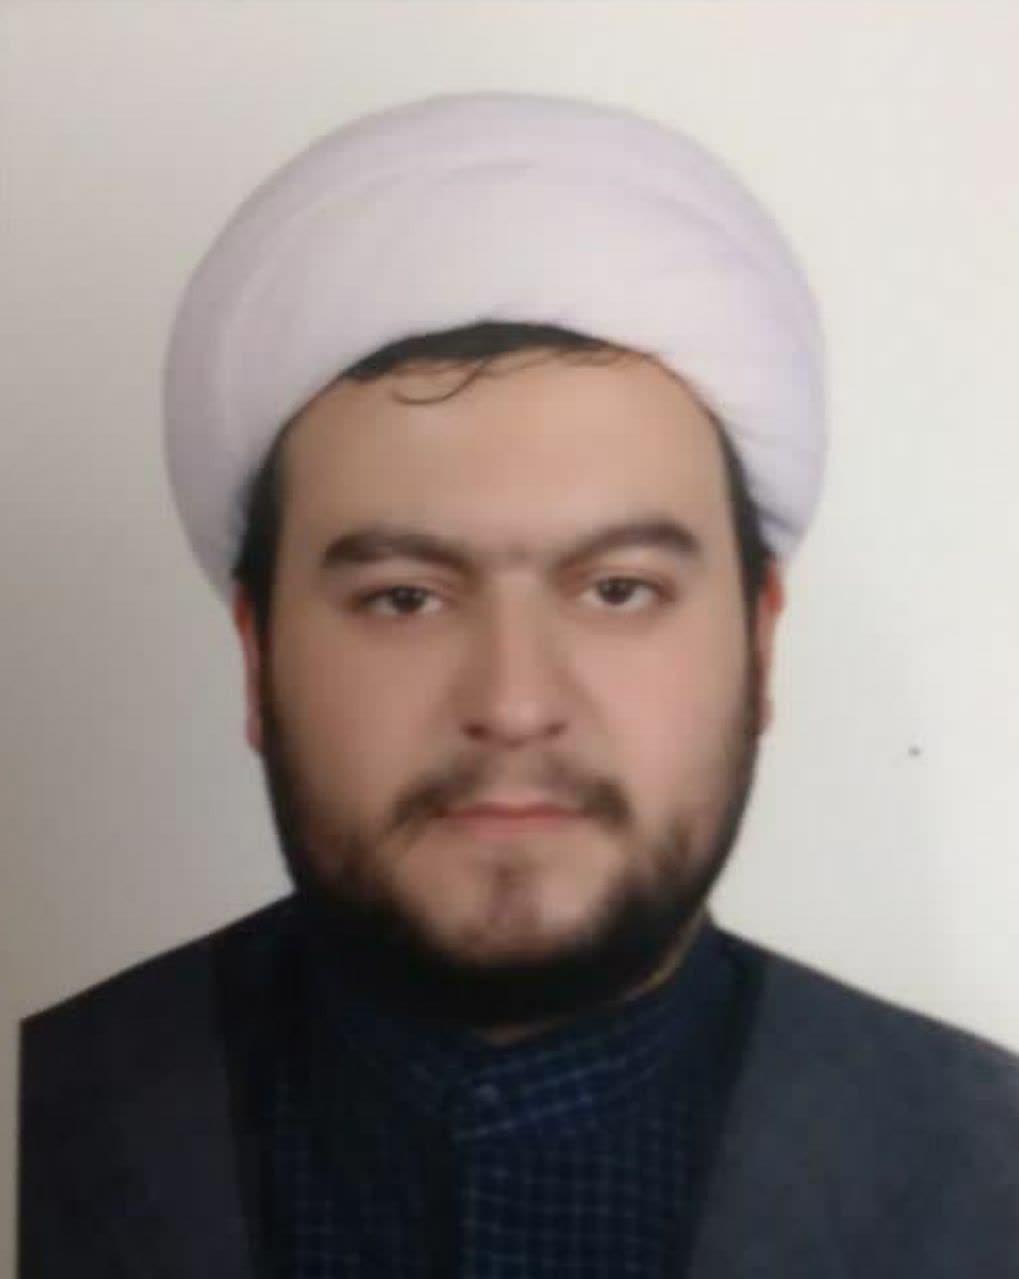 زندگینامه حجت الاسلام والمسلمین علی خلیل نژادی